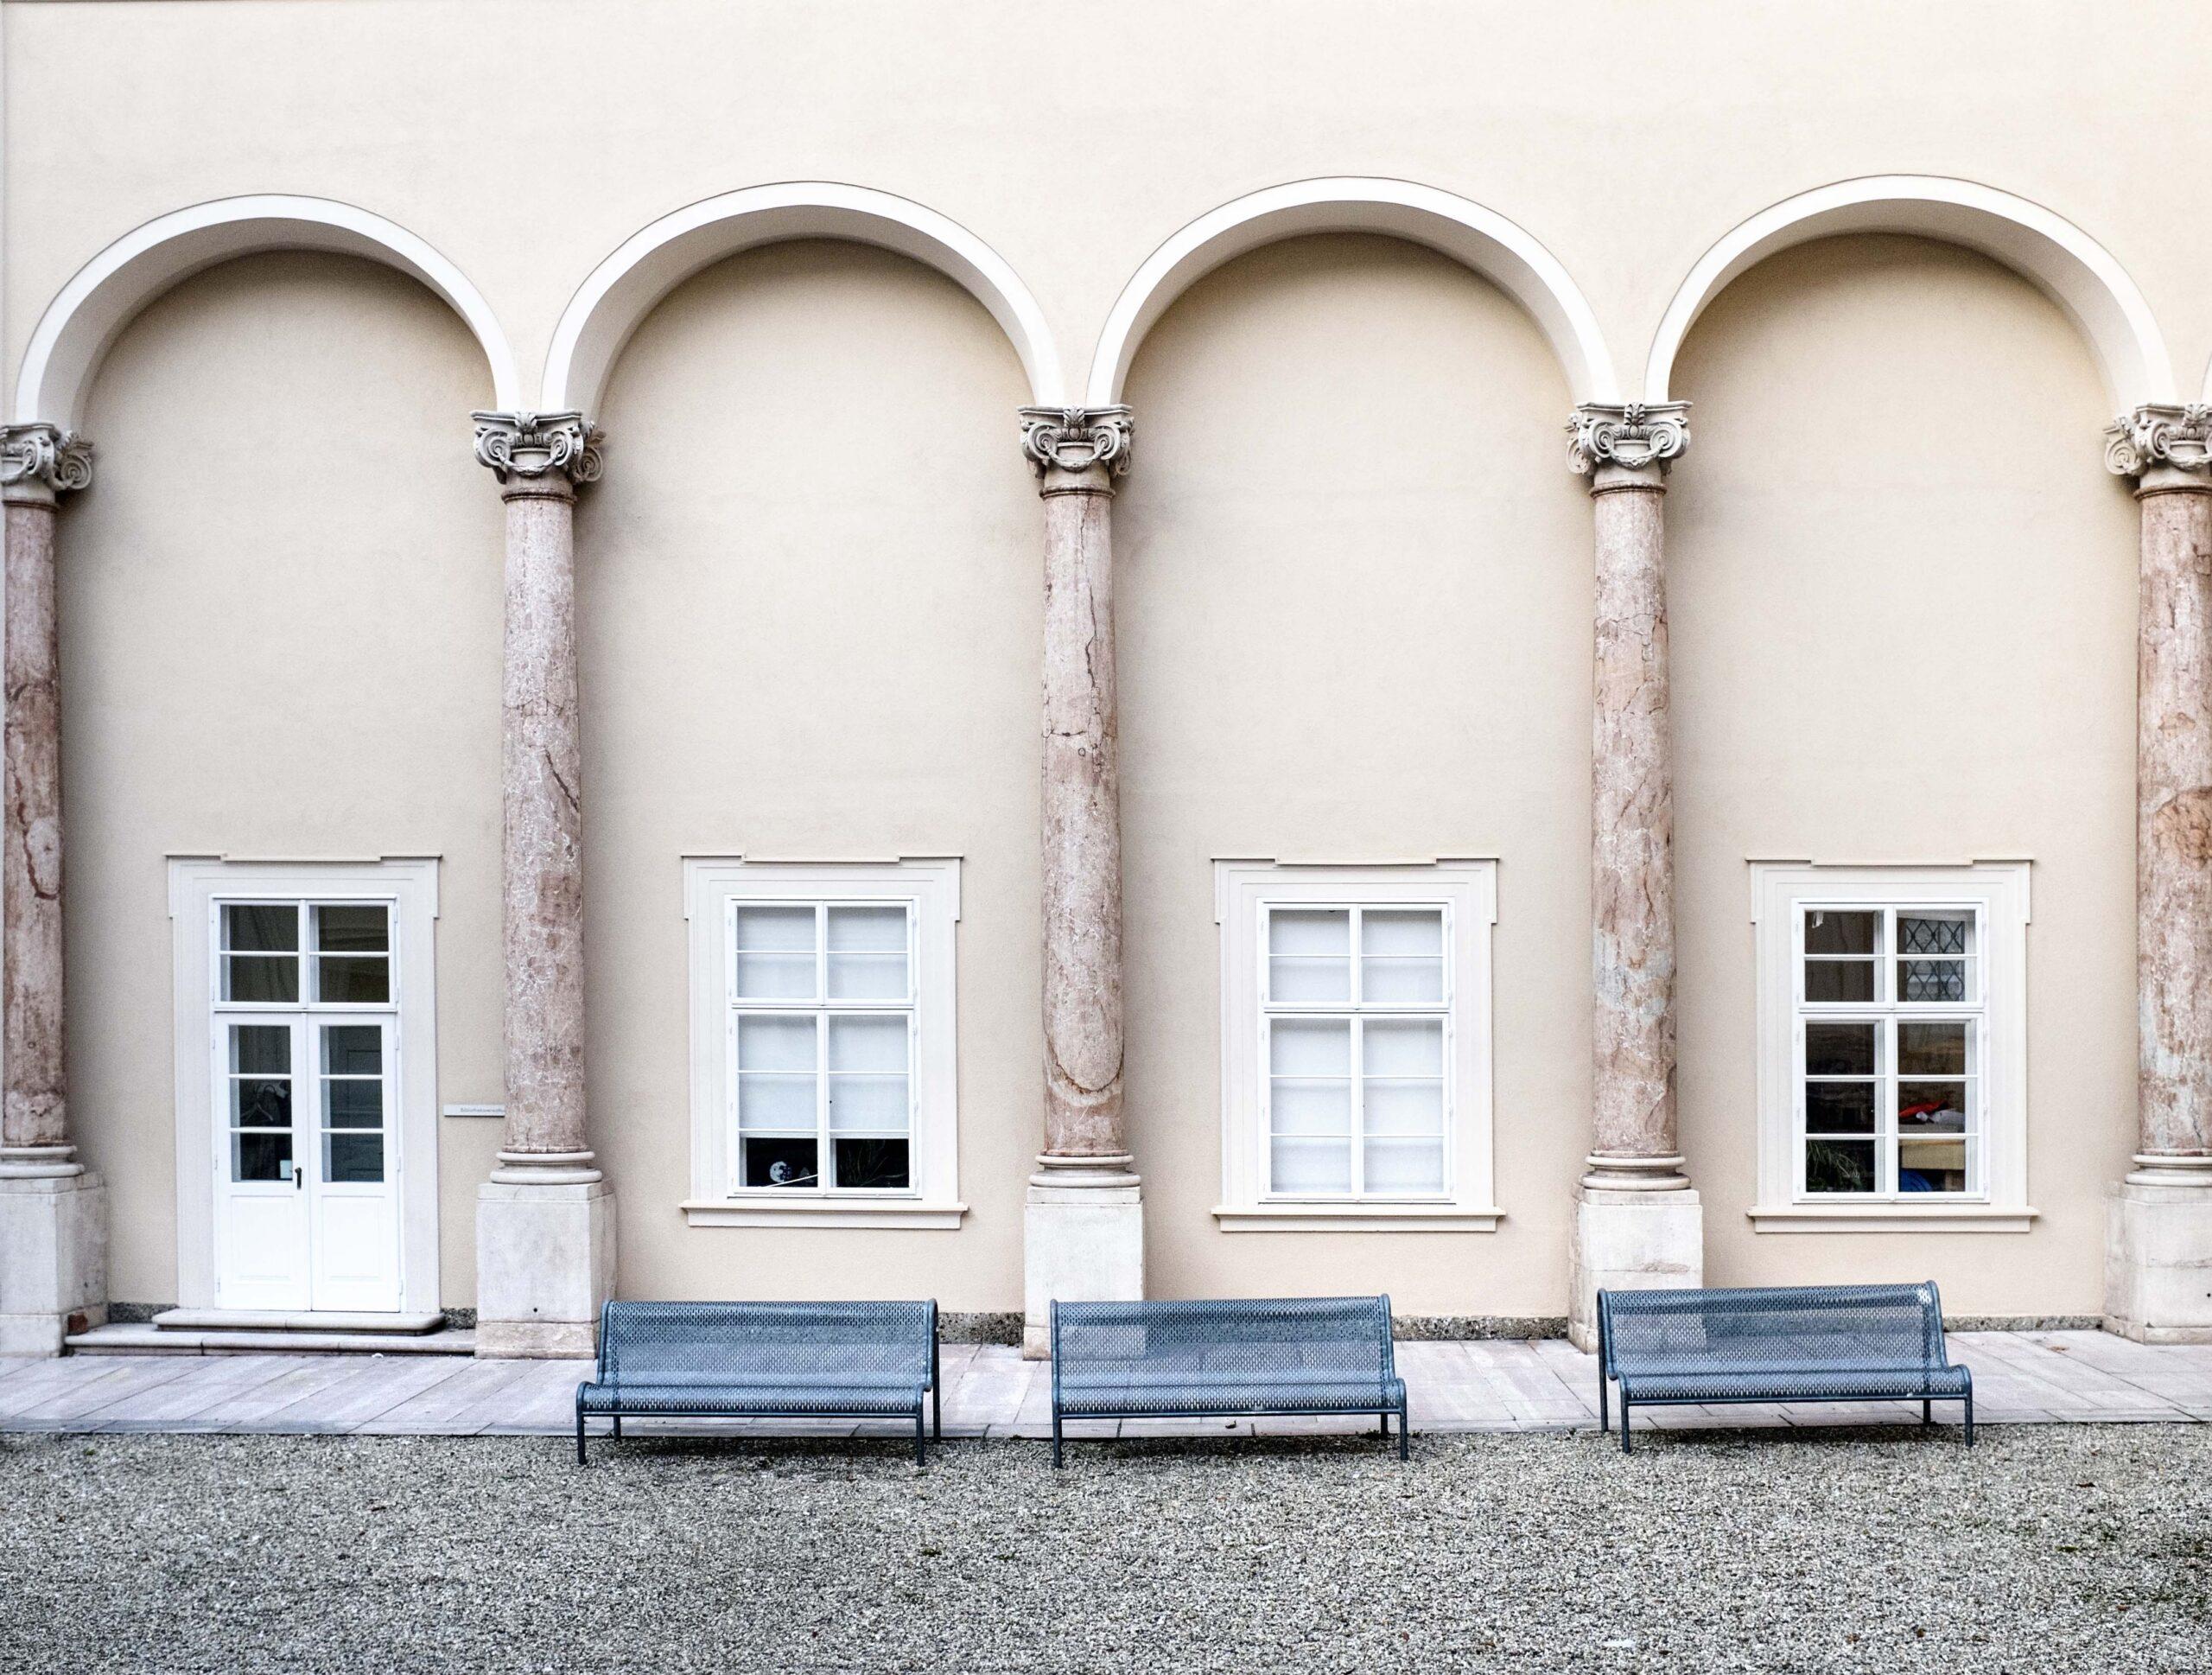 Bänk im Toskanatrakt an der RW-Fakultät an der Uni Salzburg